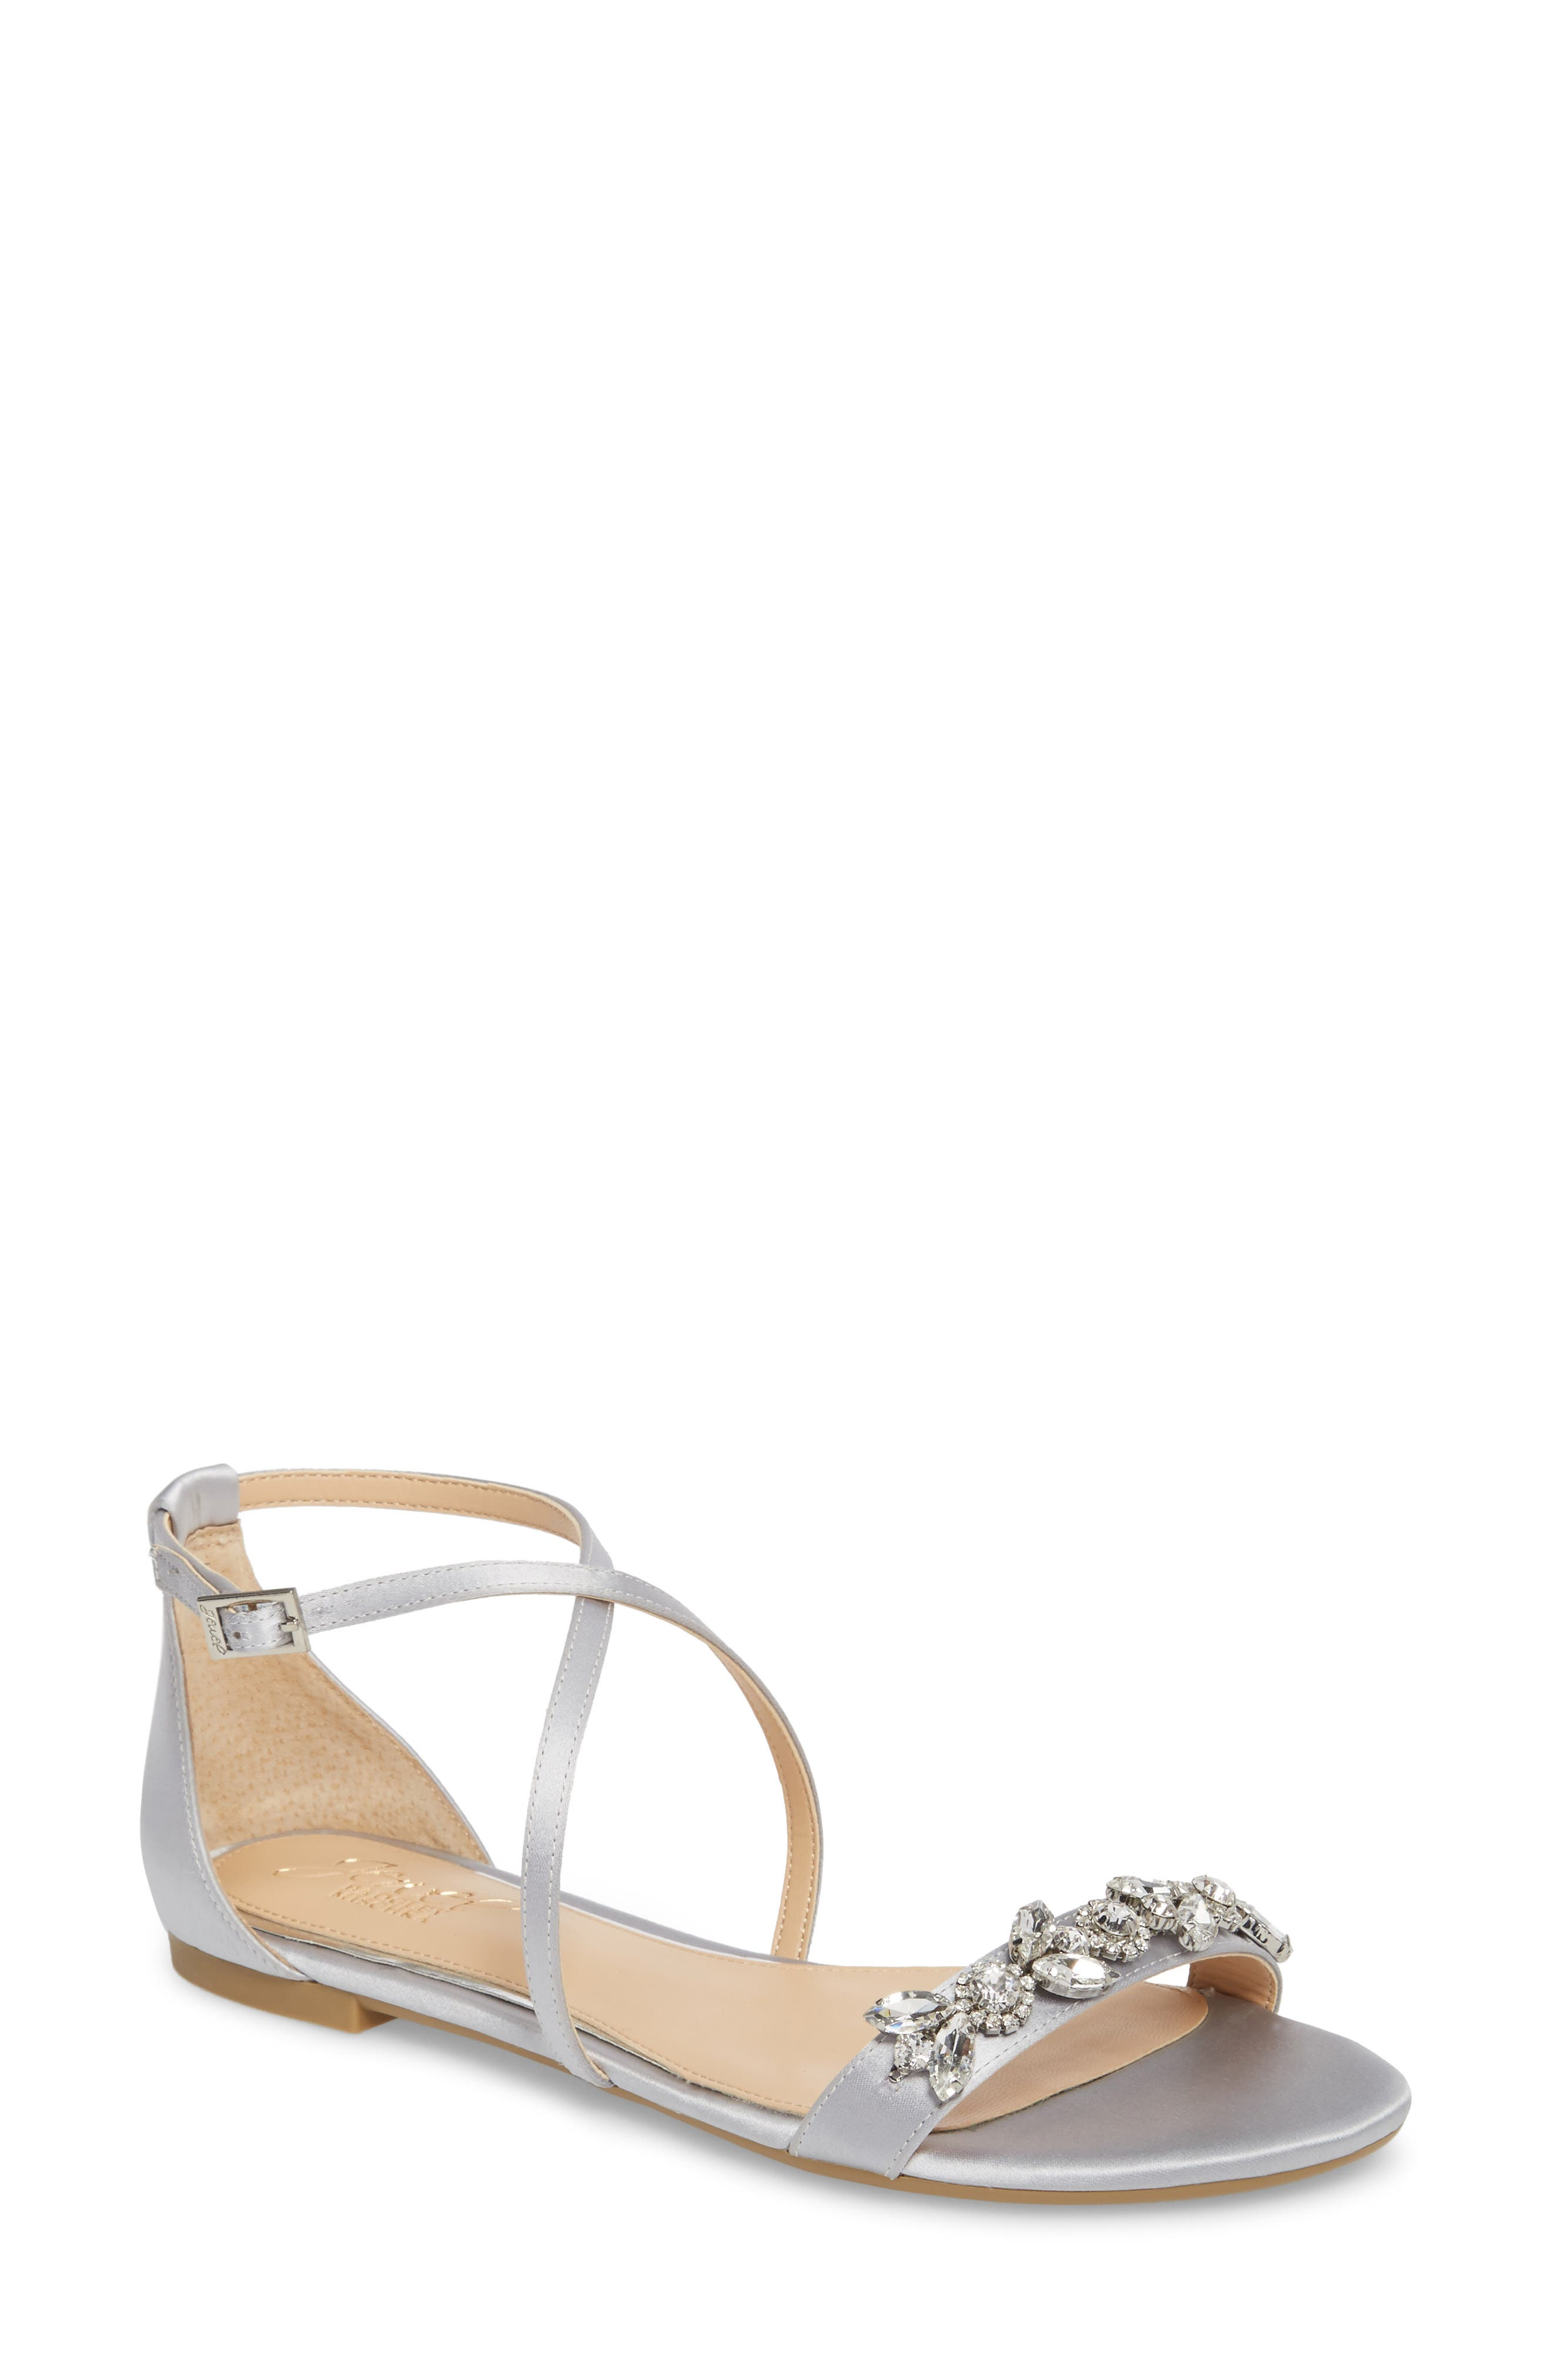 Tessy Embellished Sandal,                             Main thumbnail 1, color,                             Silver Satin